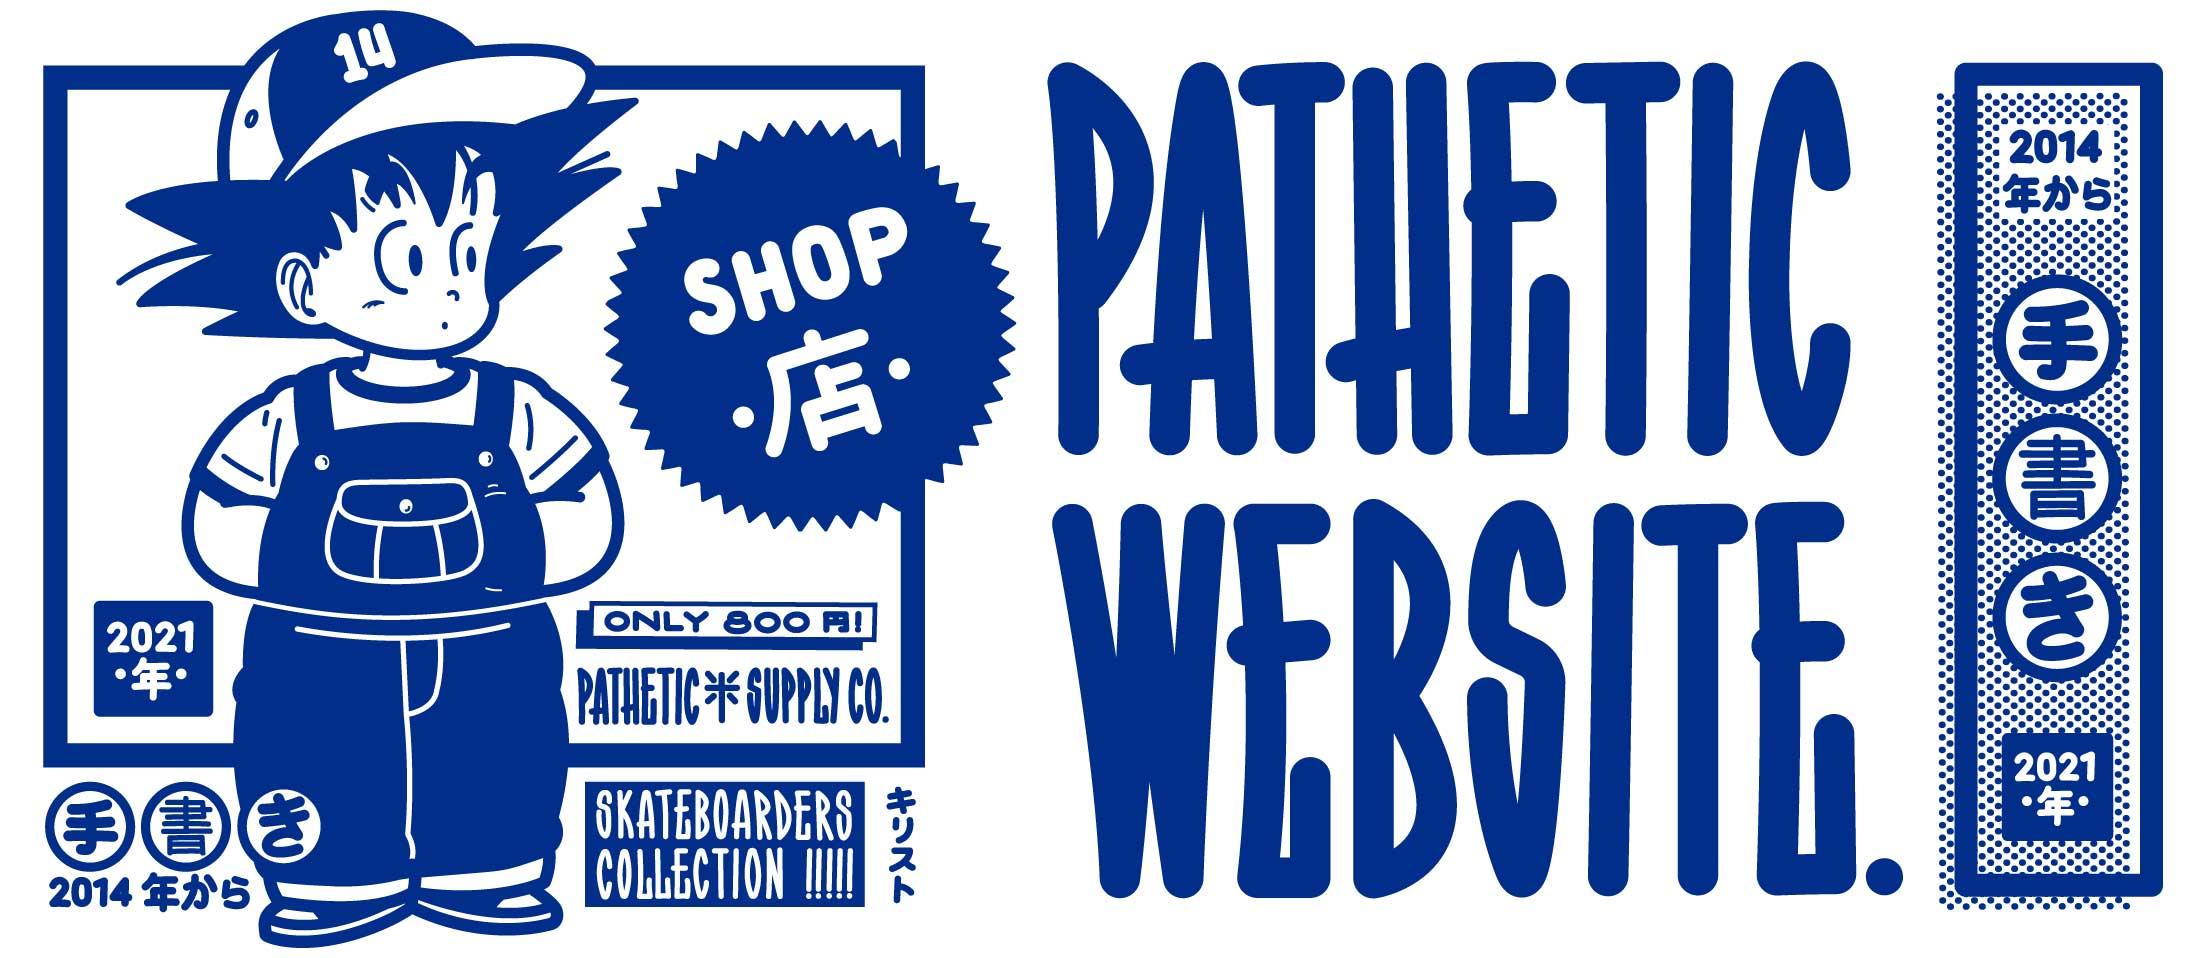 skate-pathetic-camisetas-shop